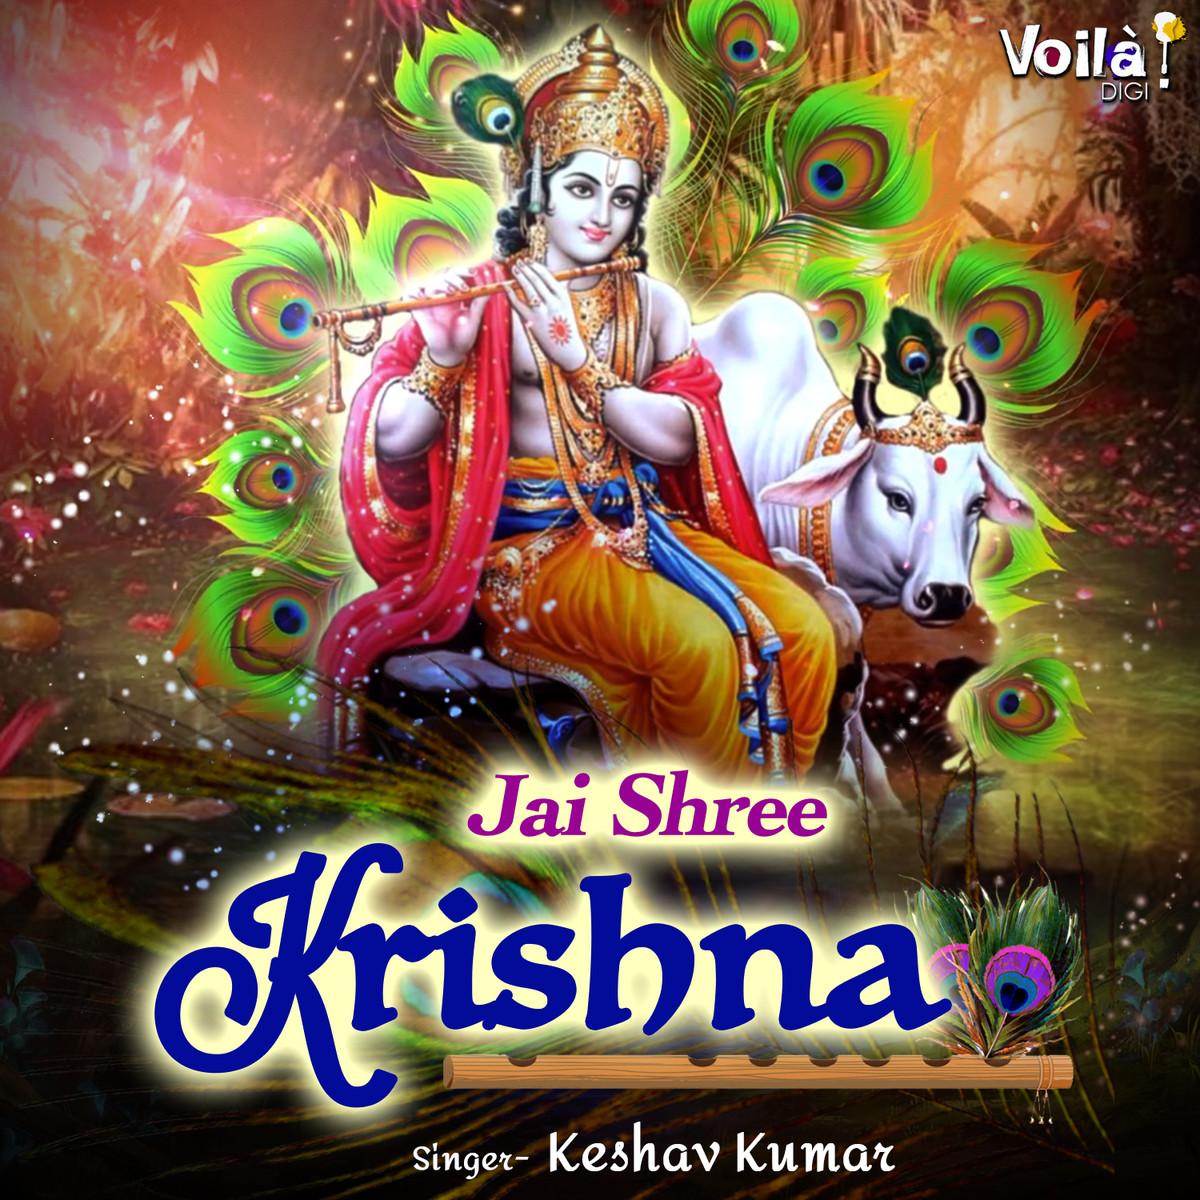 Jai Shree Krishna Song Download Jai Shree Krishna Mp3 Song Online Free On Gaana Com